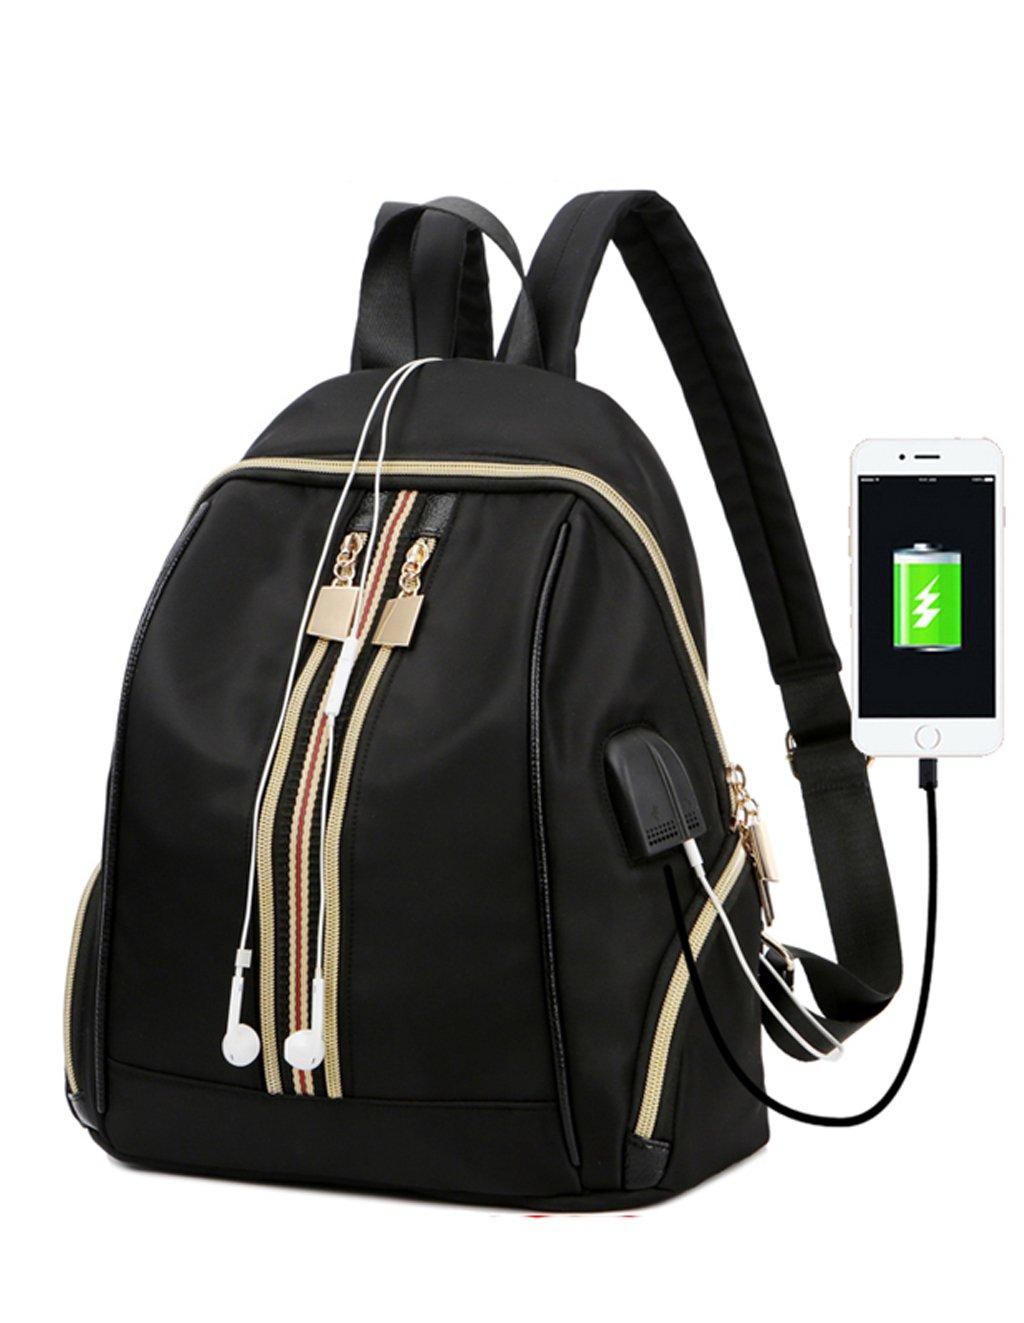 DZC Fashion nylon camouflage waterproof knapsack female Laptop Bag Girl handbag USB charging interface headphone interface school bag (black)